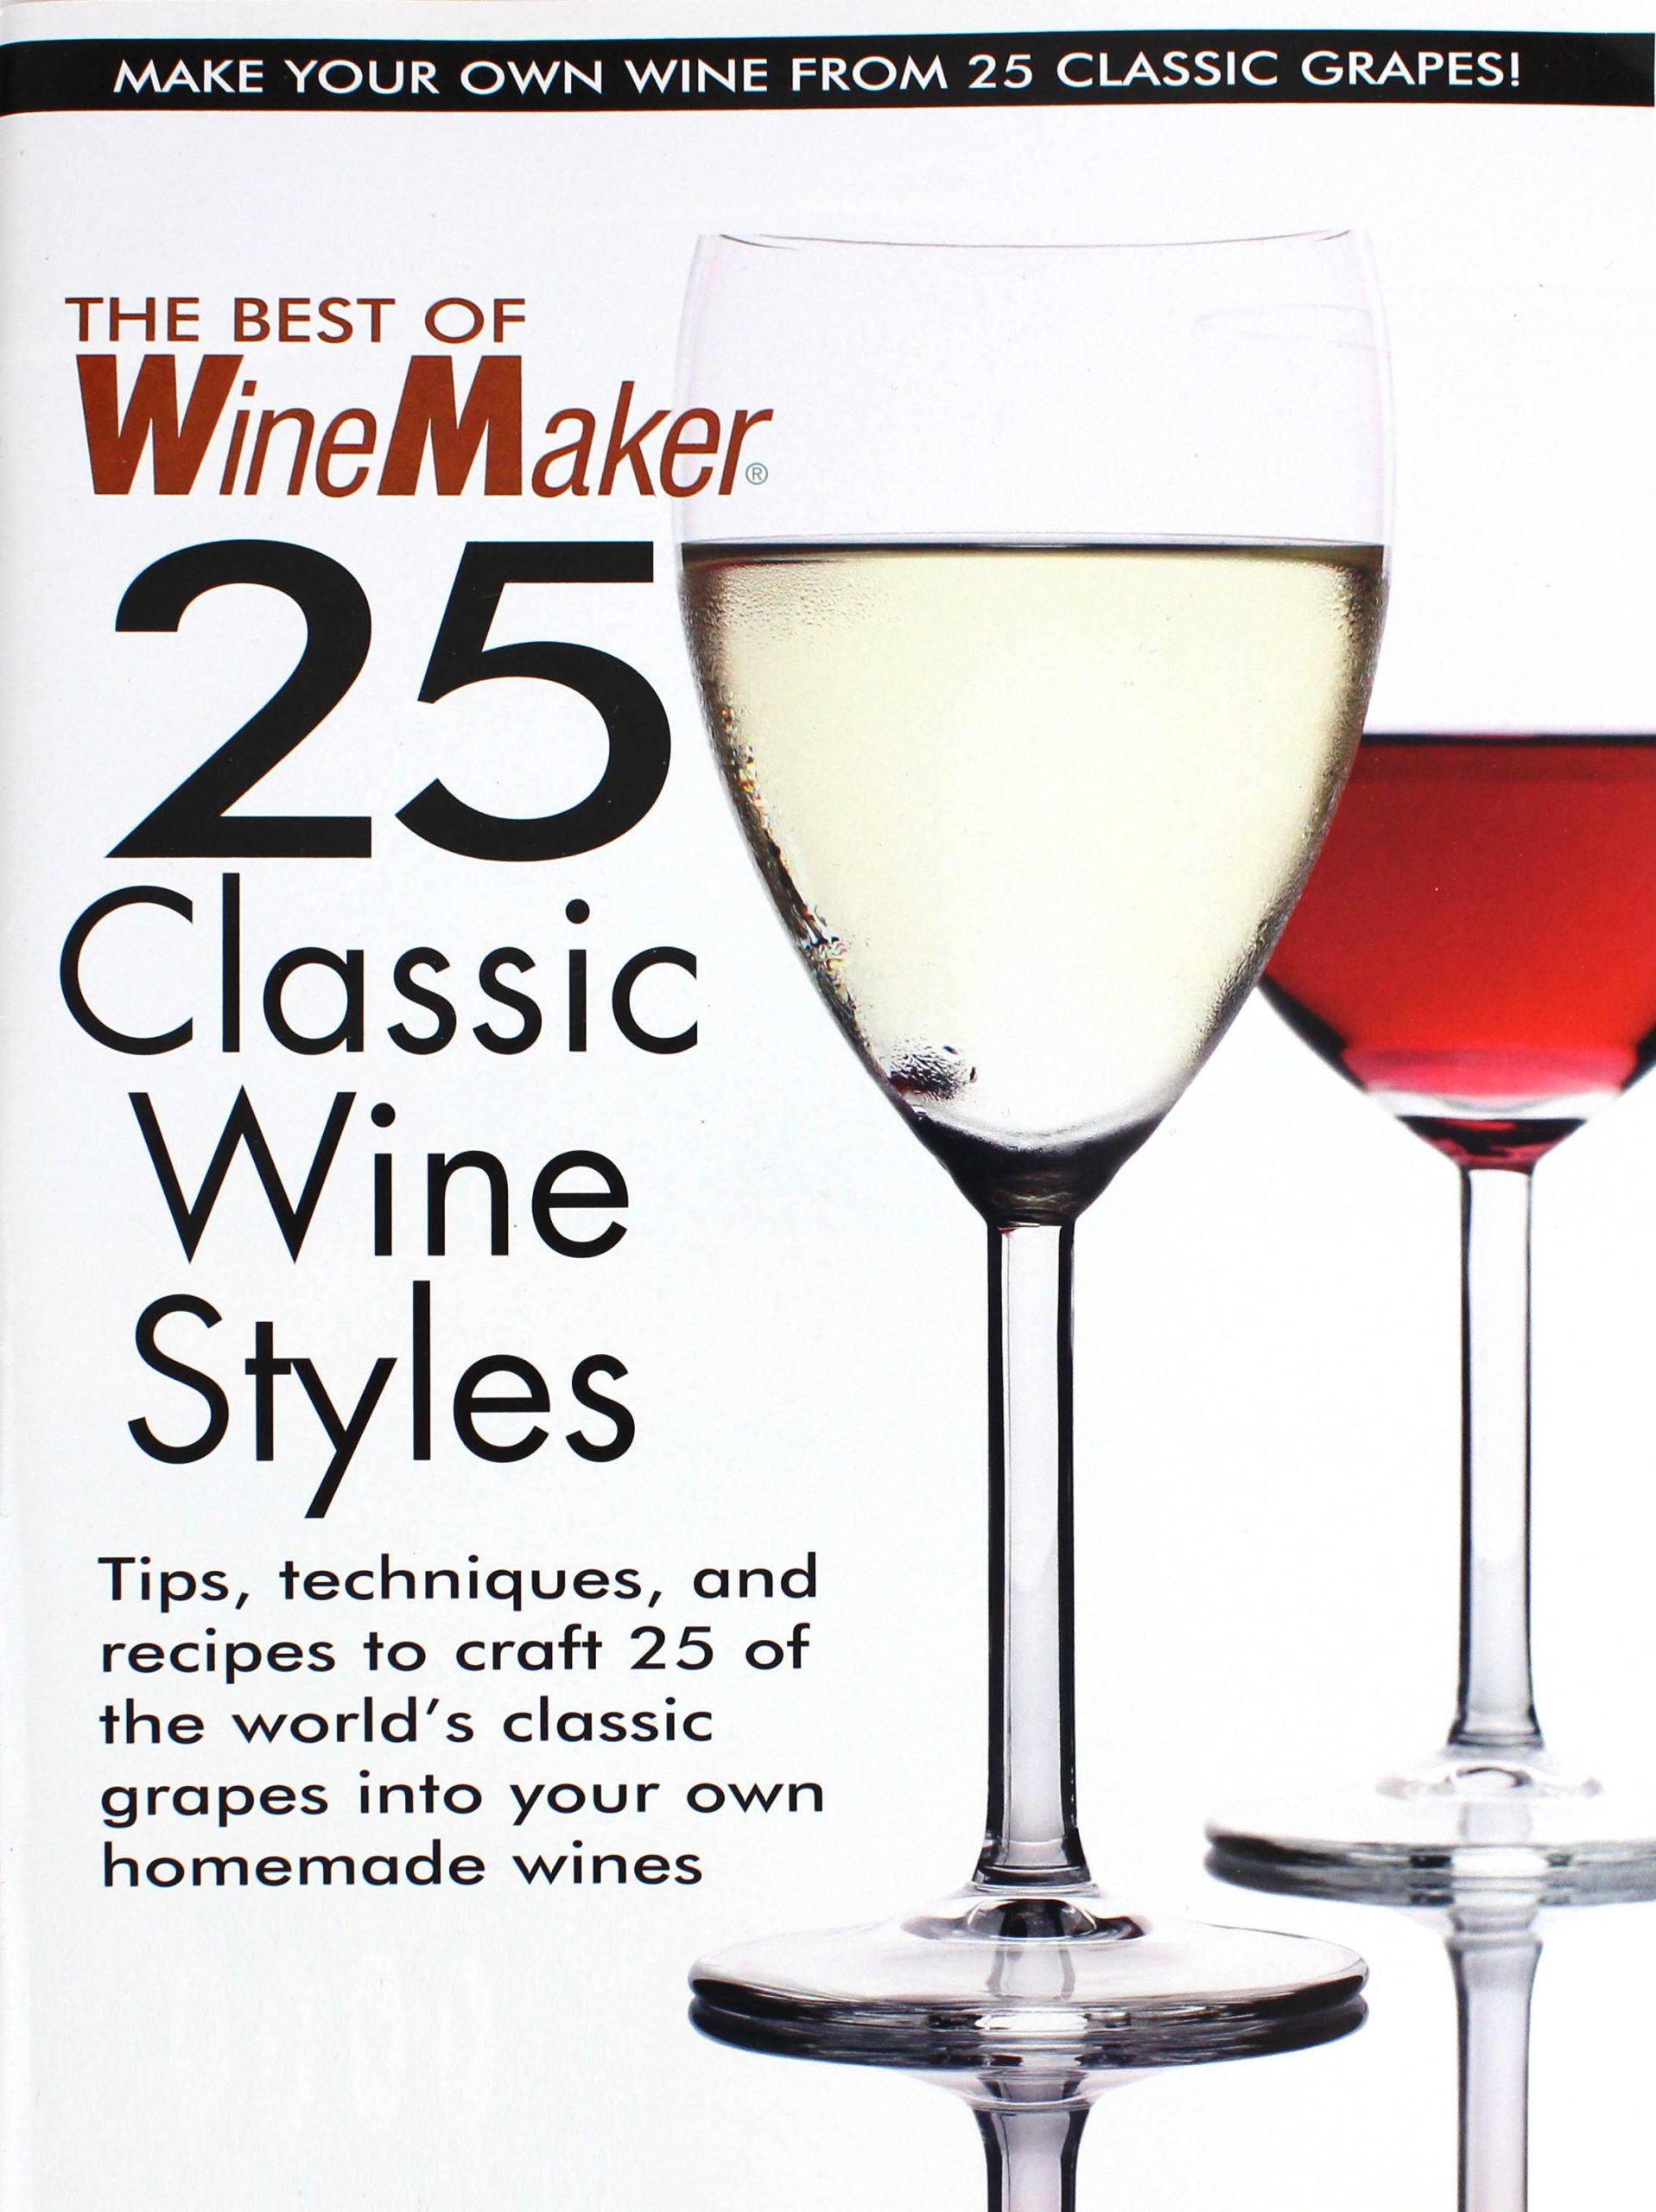 Winemaker 25 Classic: Wine Styles (1)